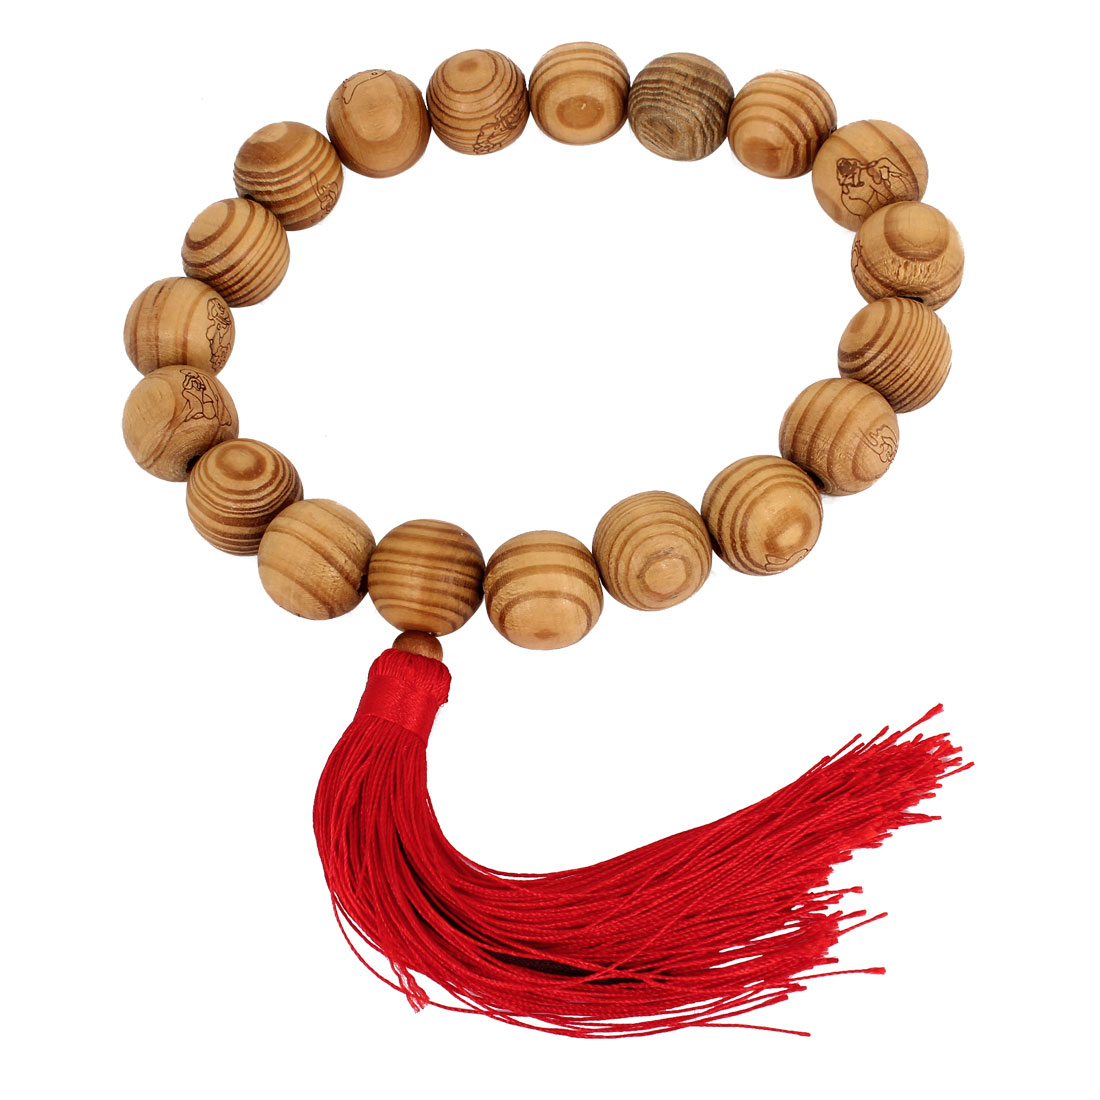 Red Nylon Tassel Detail Wooden Buddha Buddhism Buddhist Bead Bracelet